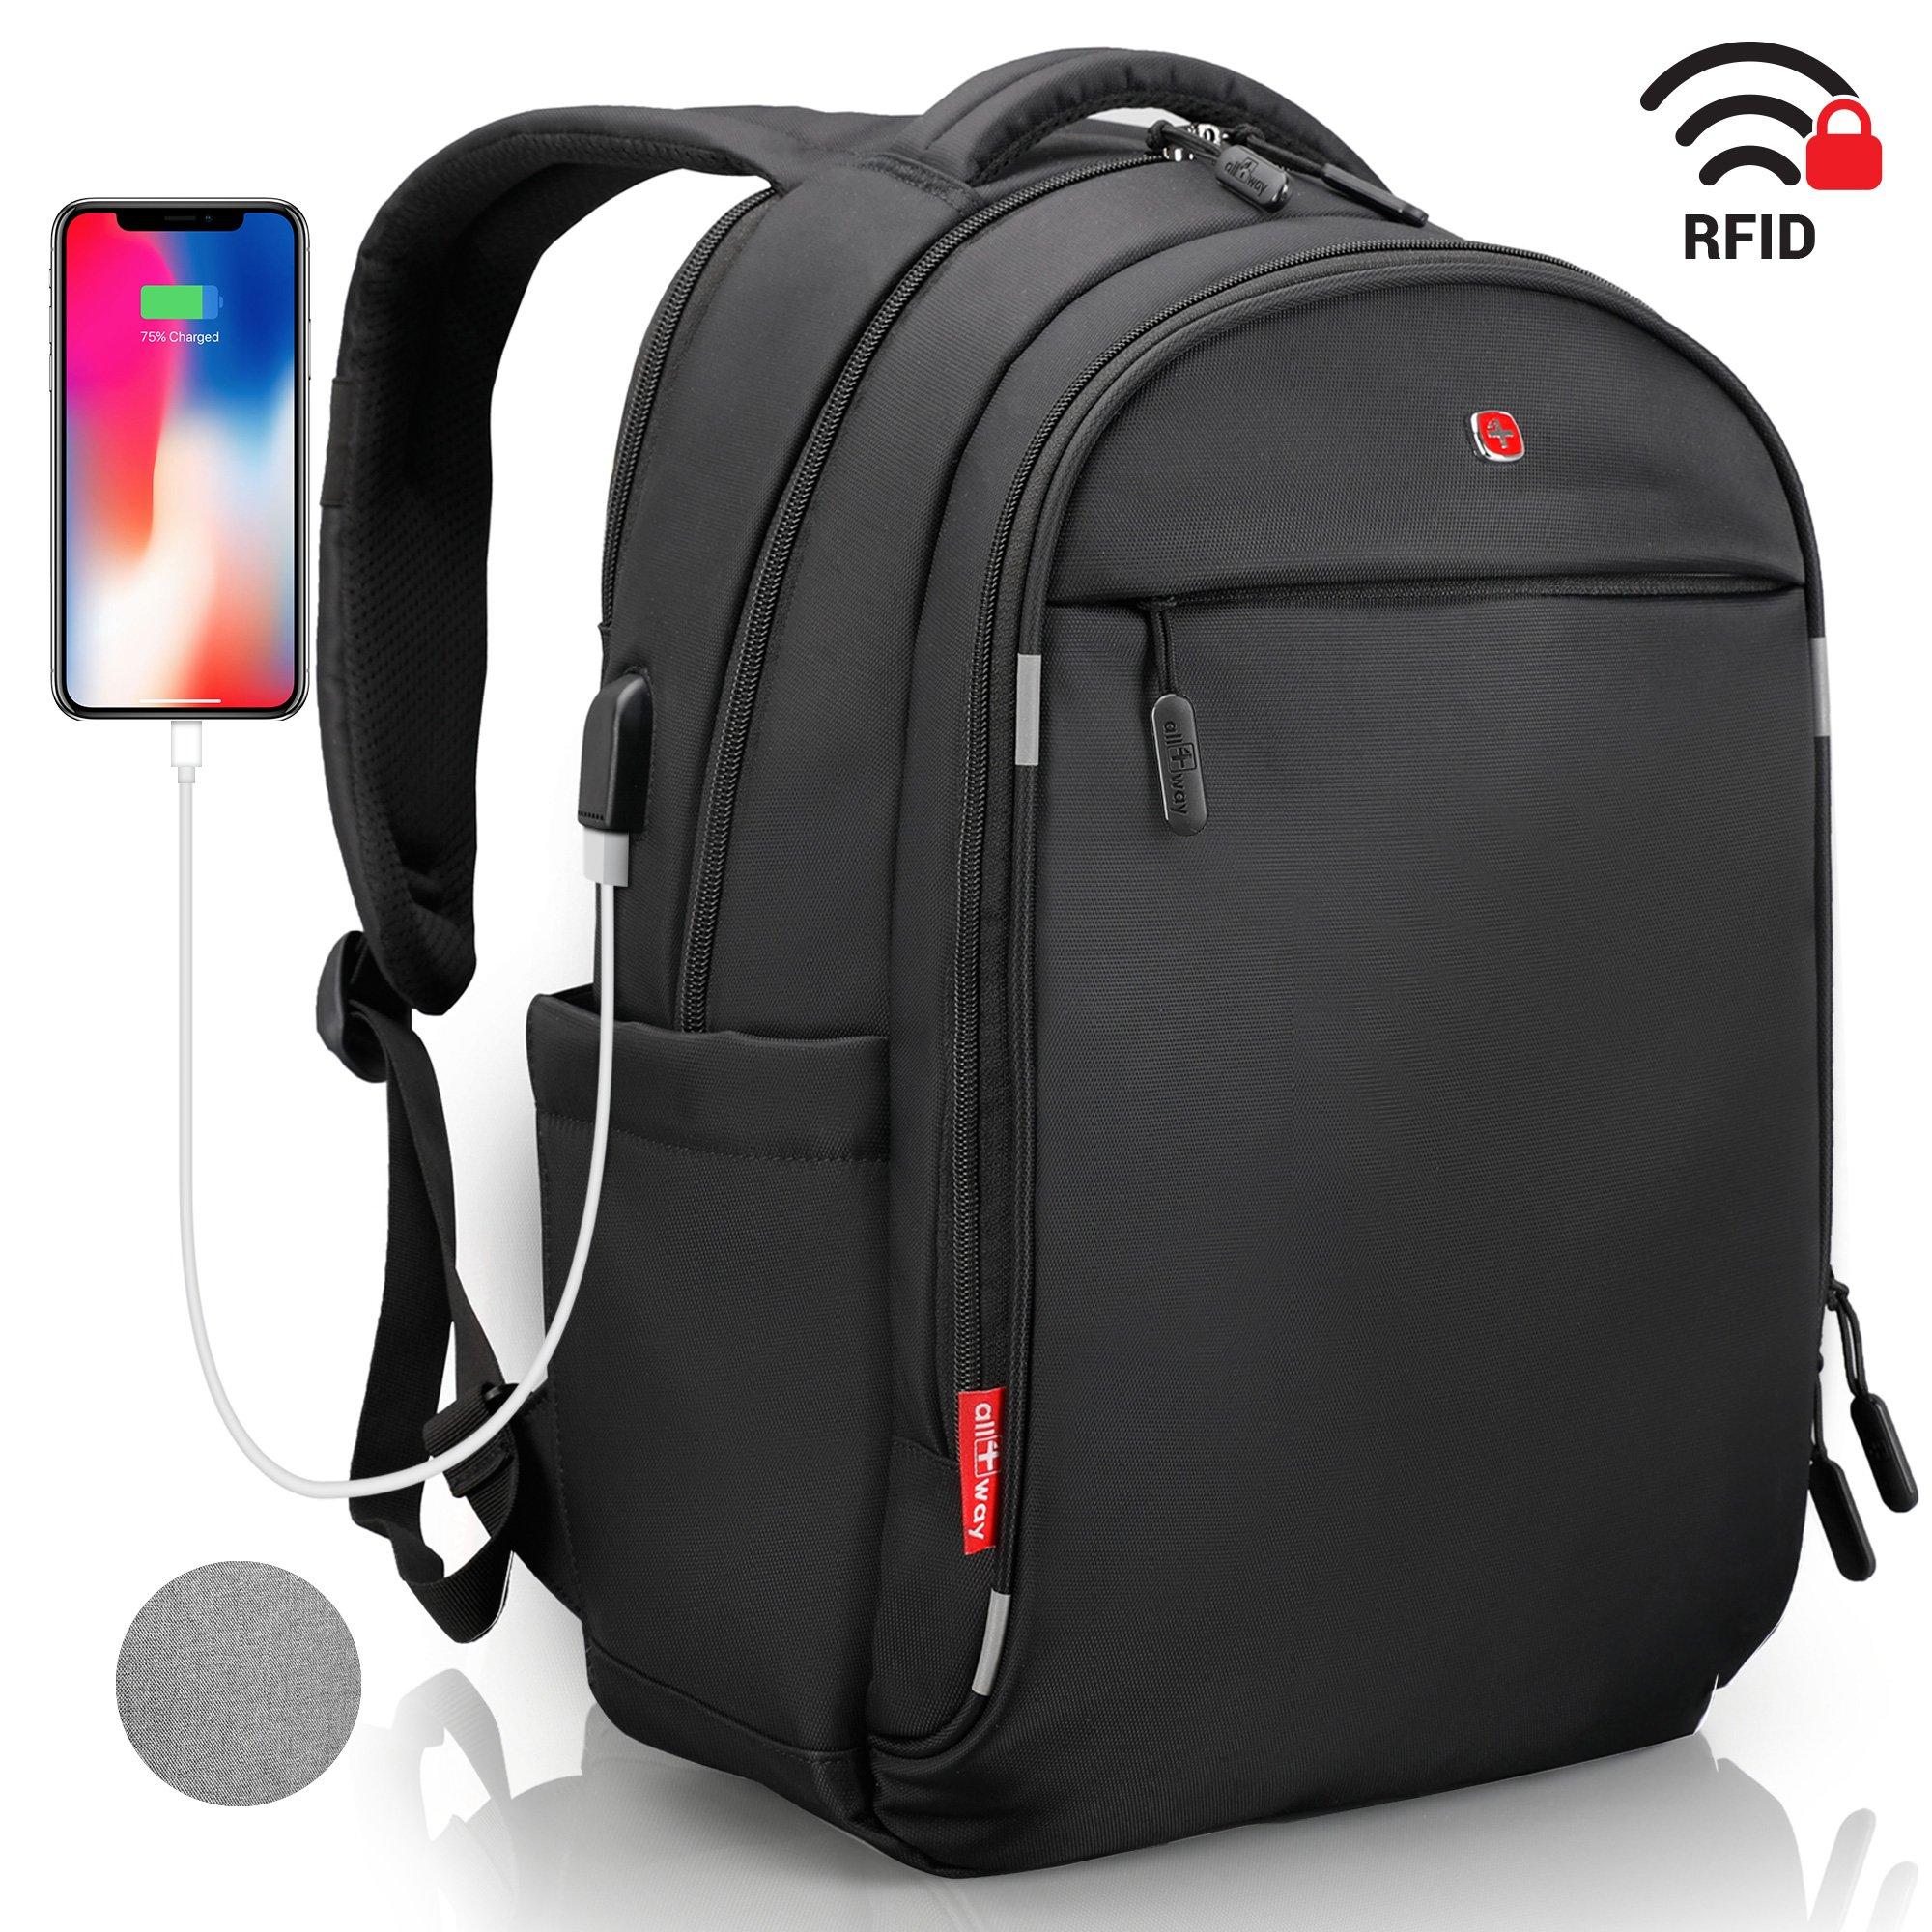 Laptop Backpack - Anti Theft Backpack Waterproof Rain Cover - SWISS Design RFID Blocking - USB Charging Port - Business College Travel School Backpack - Black Backpack for Men Women 15.6 inch